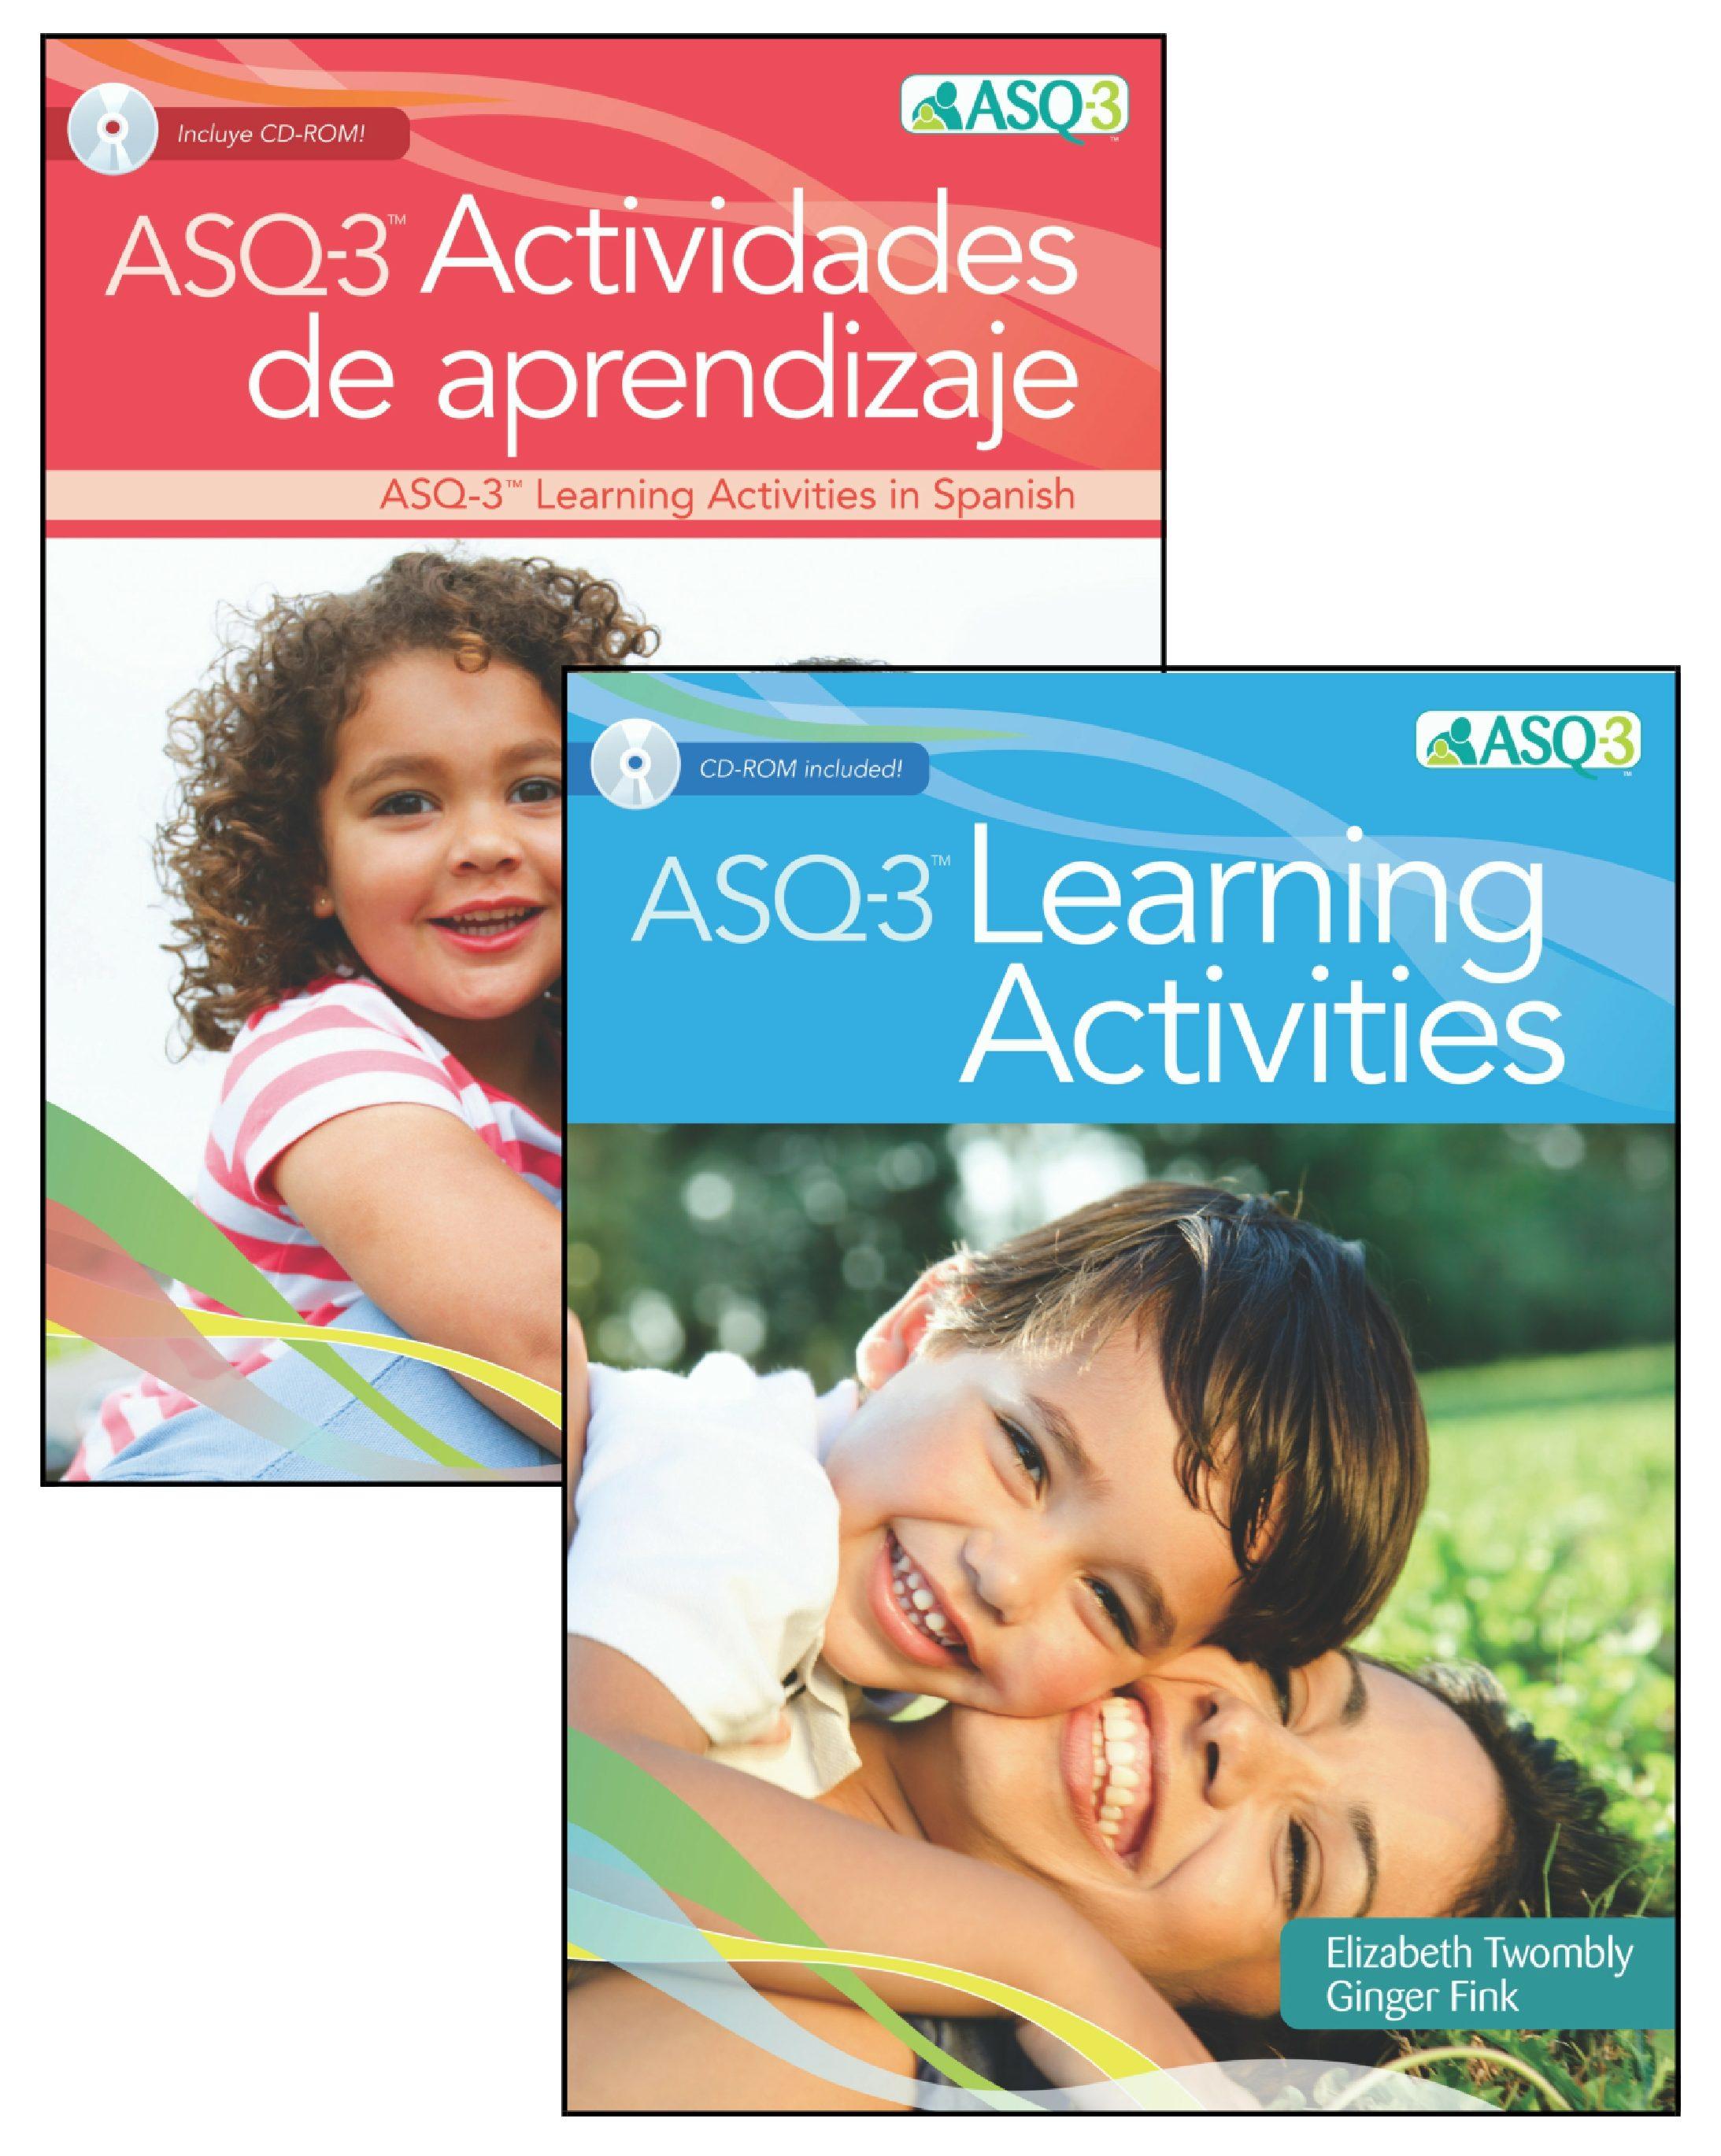 ASQ-3 Learning Activities and ASQ-3 Actividades de aprendizaje